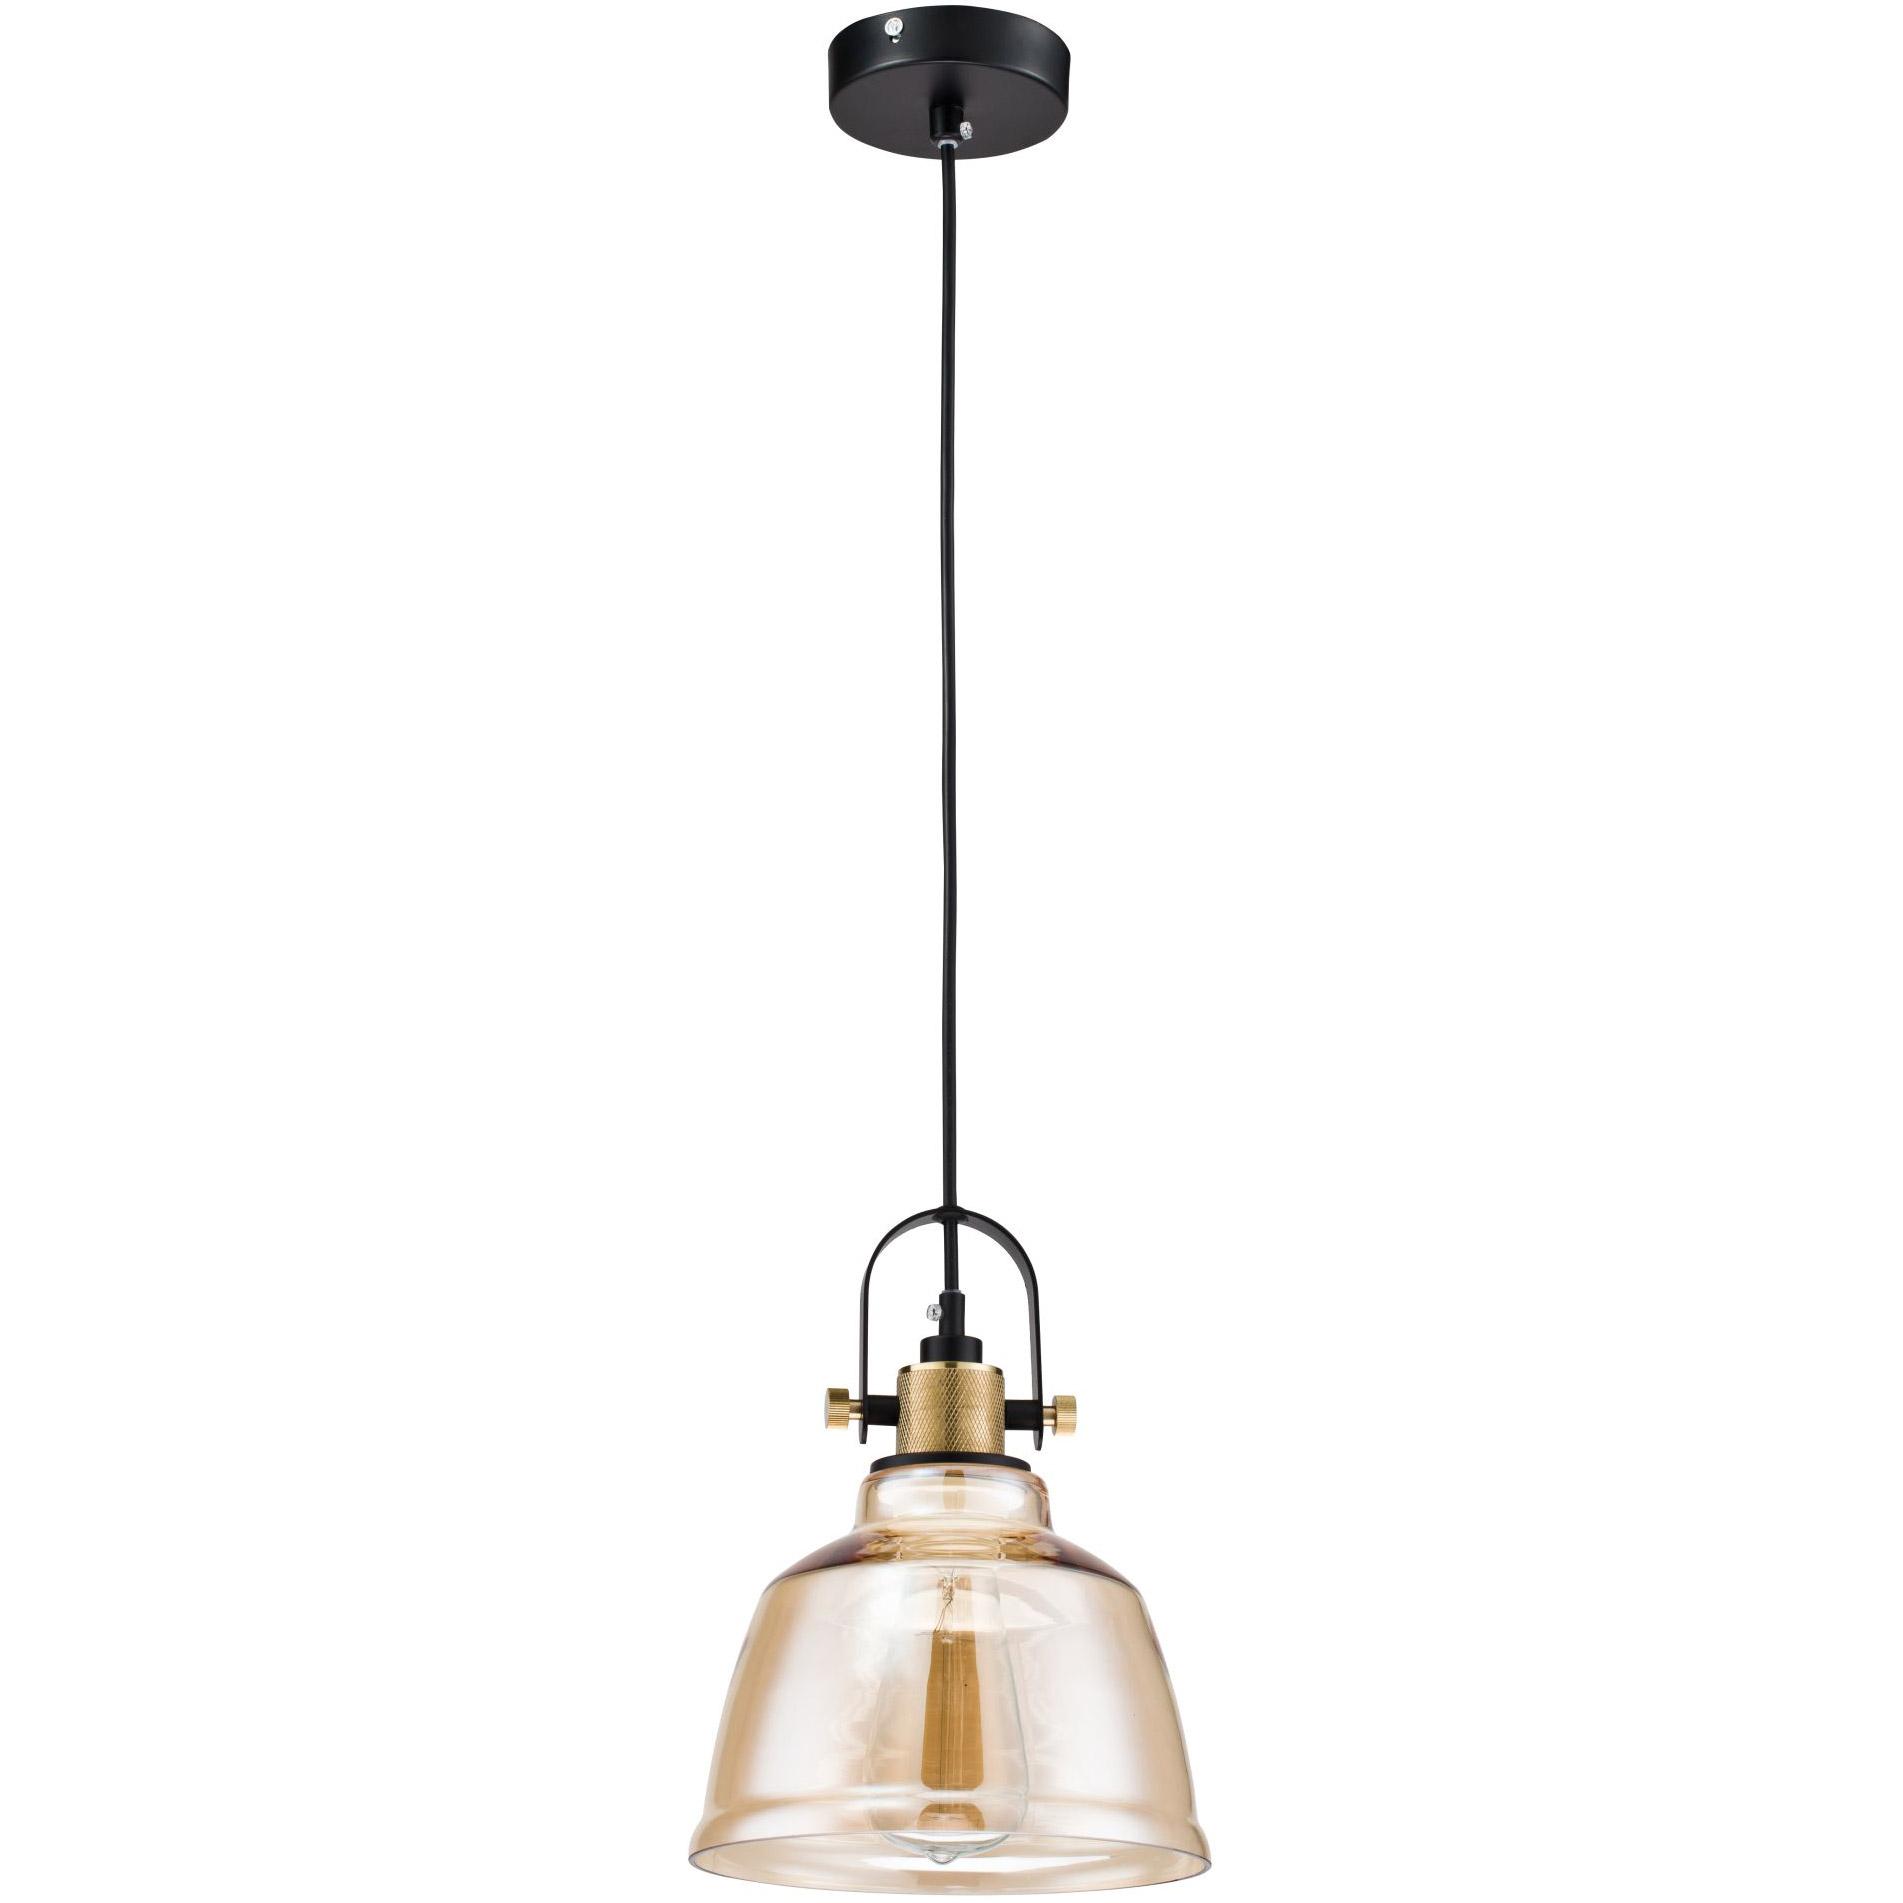 Lampka Loft wisząca do kuchni - bursztynowe szkło Irving Maytoni